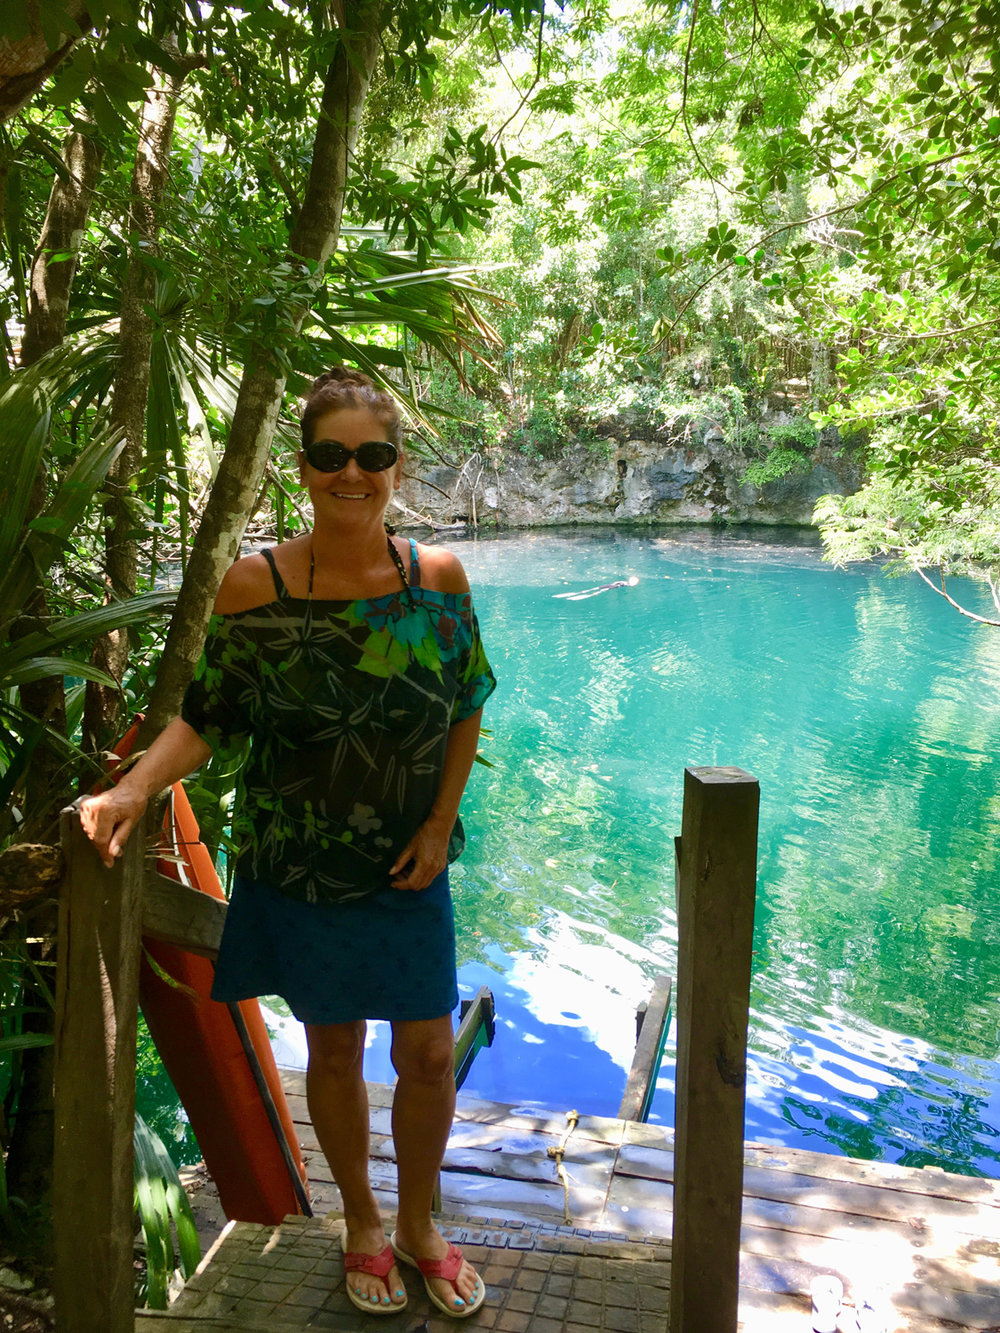 Hammocks_and_Ruins_Blog_Riviera_Maya_Mexico_Travel_Discover_Cenotes_Scuba_Dive_Cenote_Angelita_2.jpg